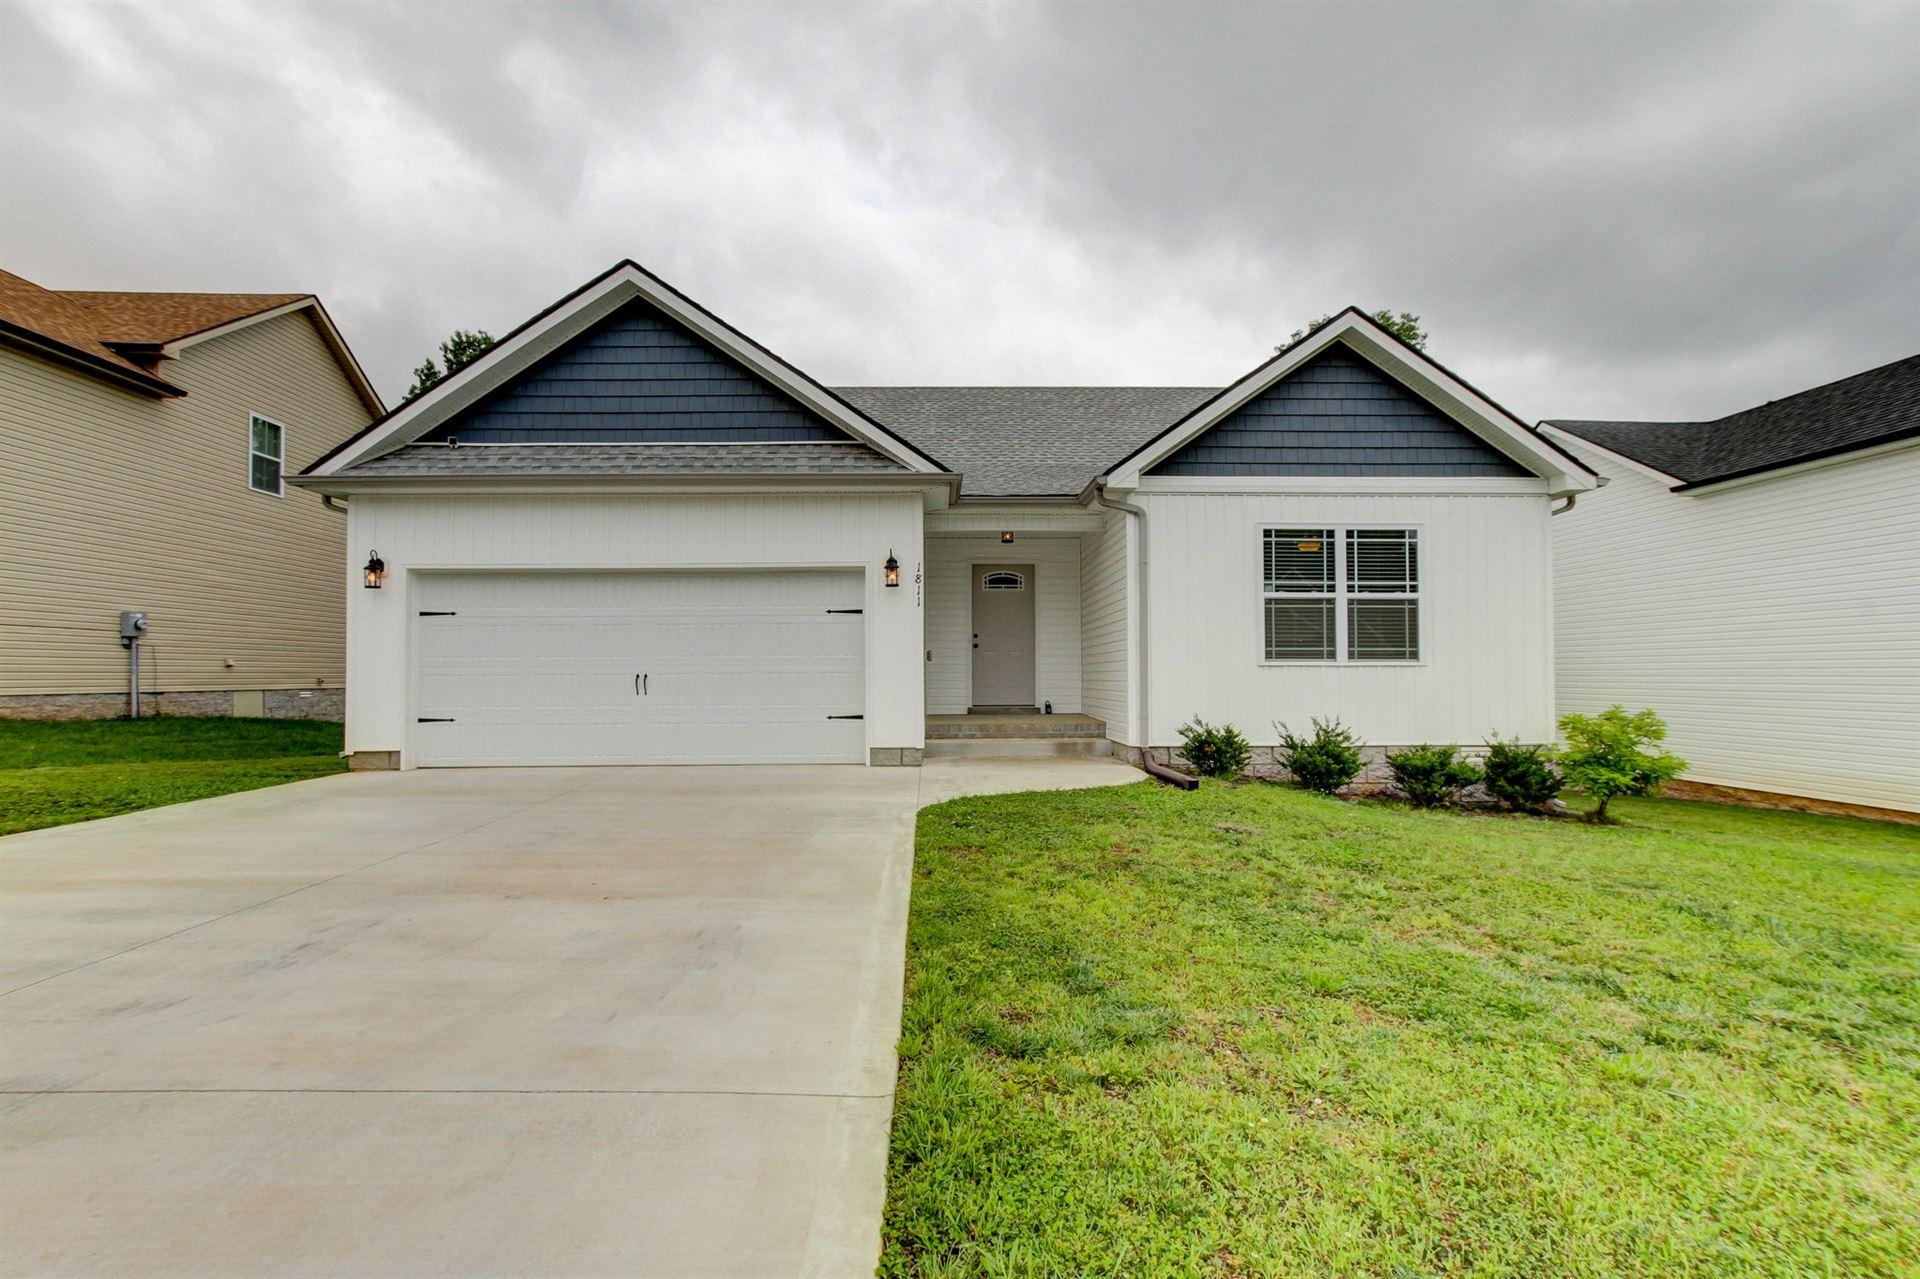 1811 Rains Rd, Clarksville, TN 37042 - MLS#: 2262239